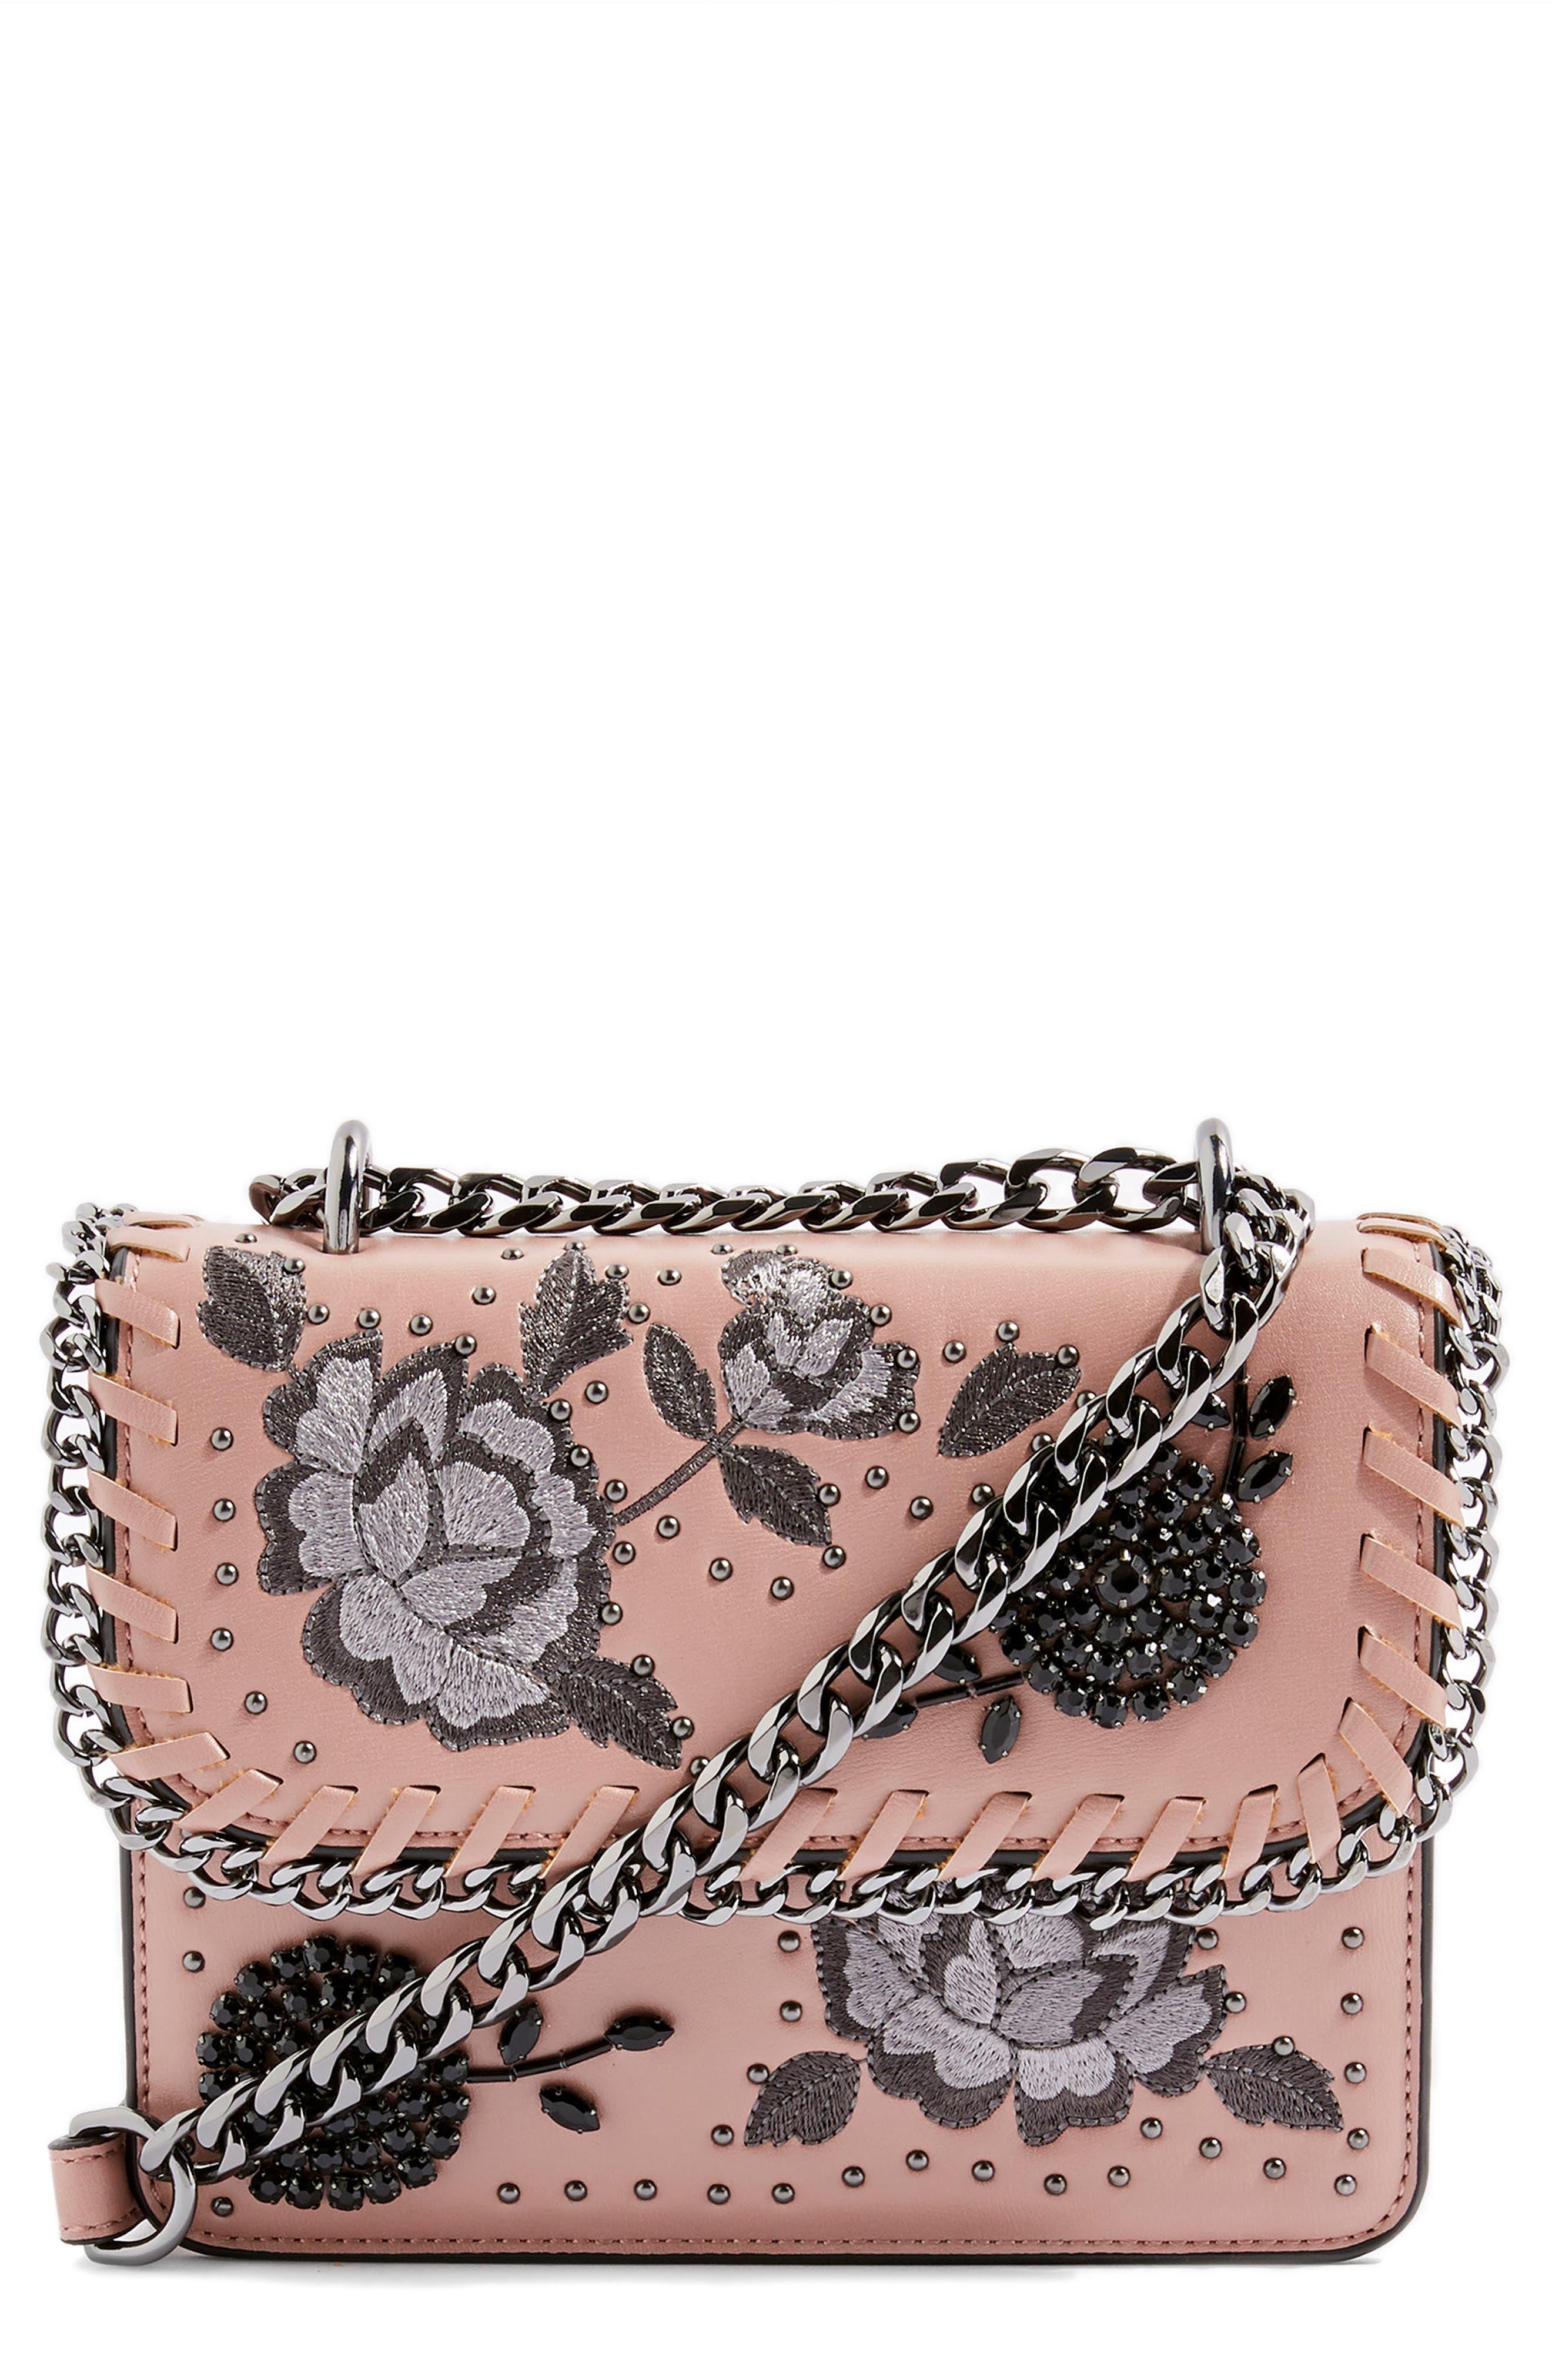 Topshop Rio Floral Crossbody Bag